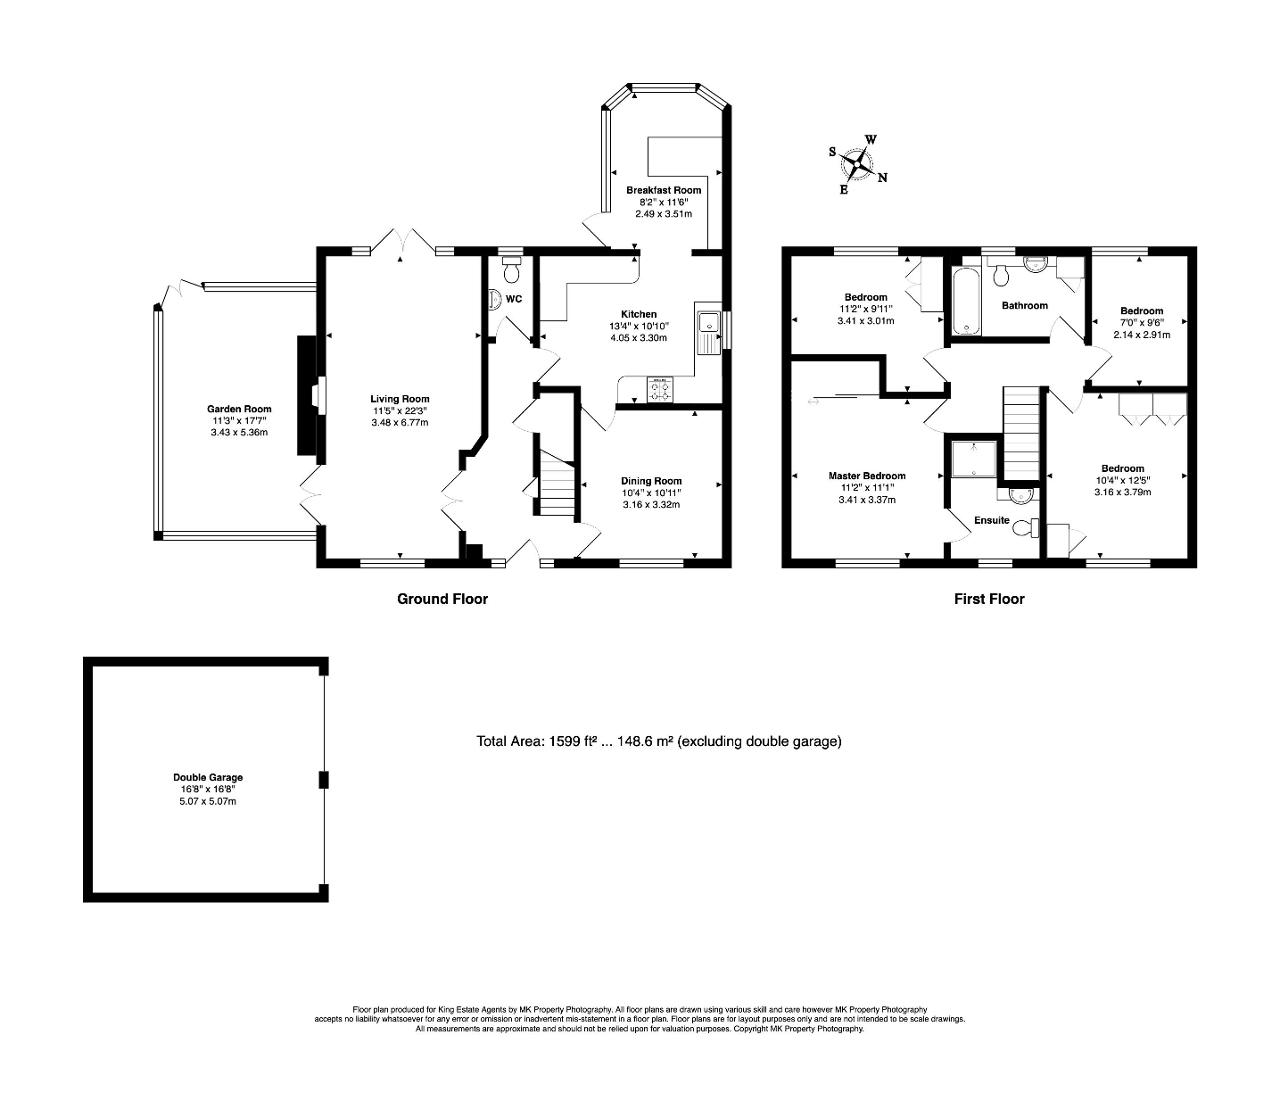 Floorplan for Millington Gate, Willen, Milton Keynes, MK15 9HT